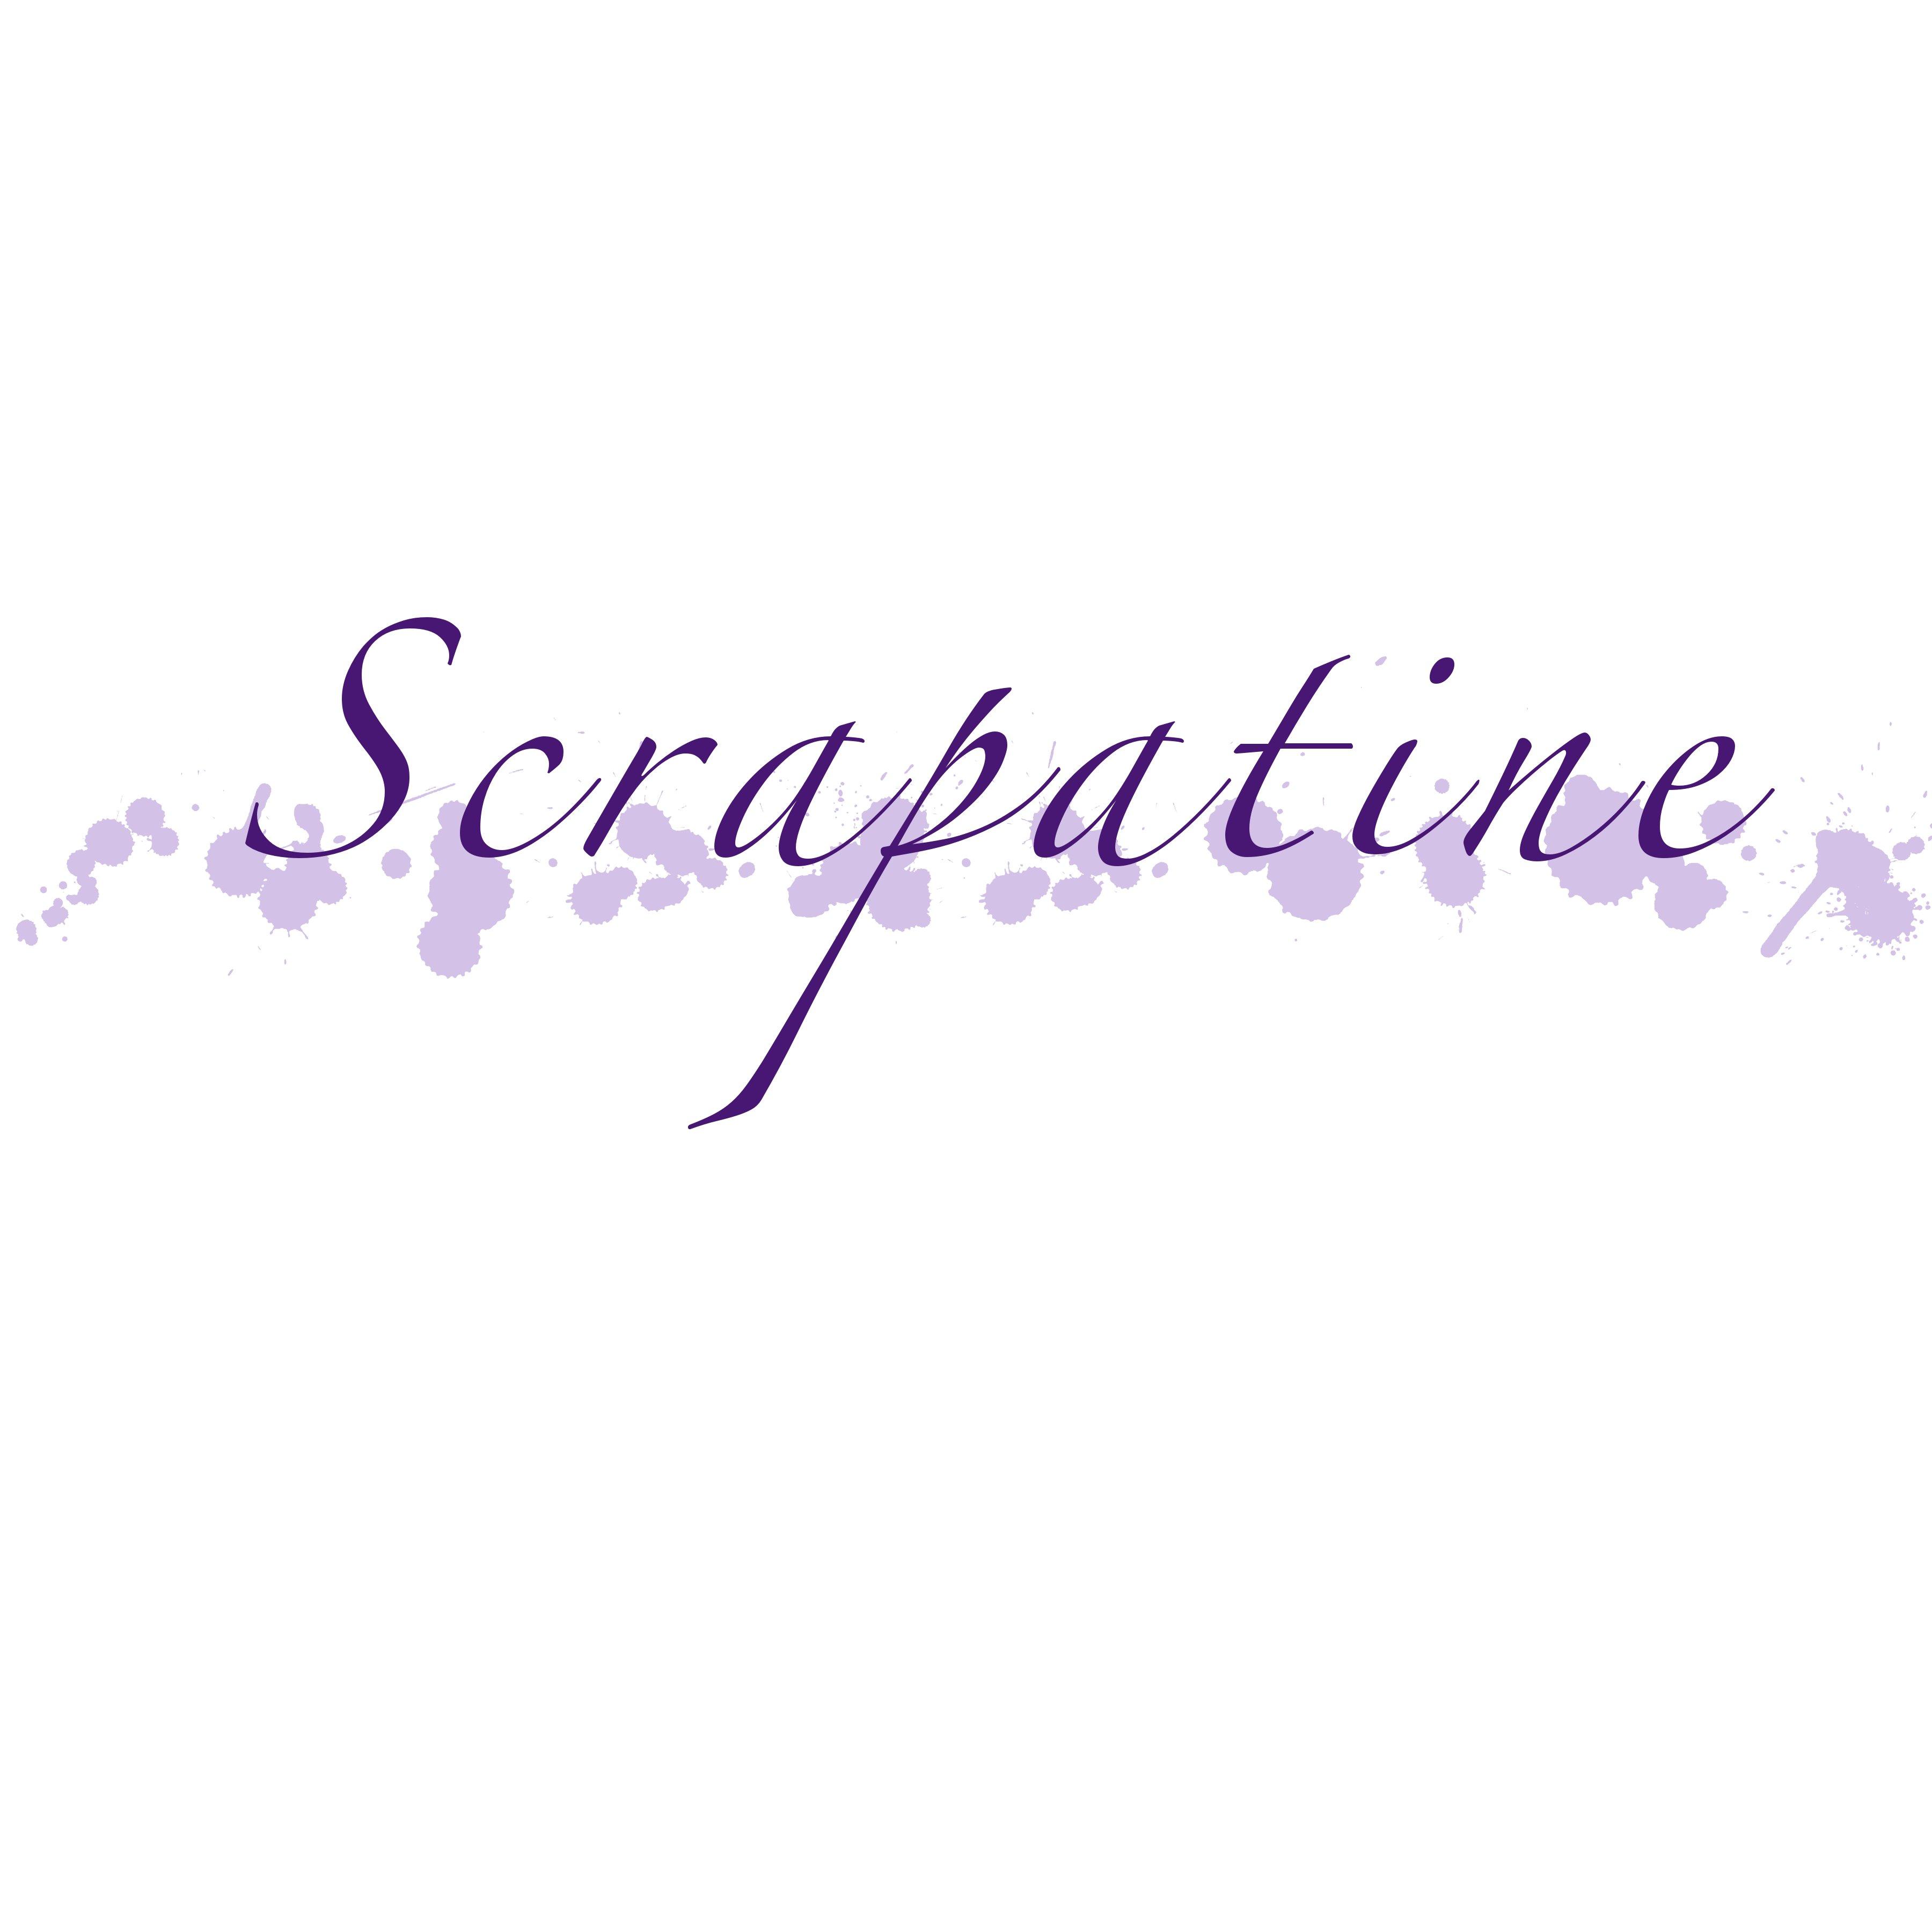 scrapatine2